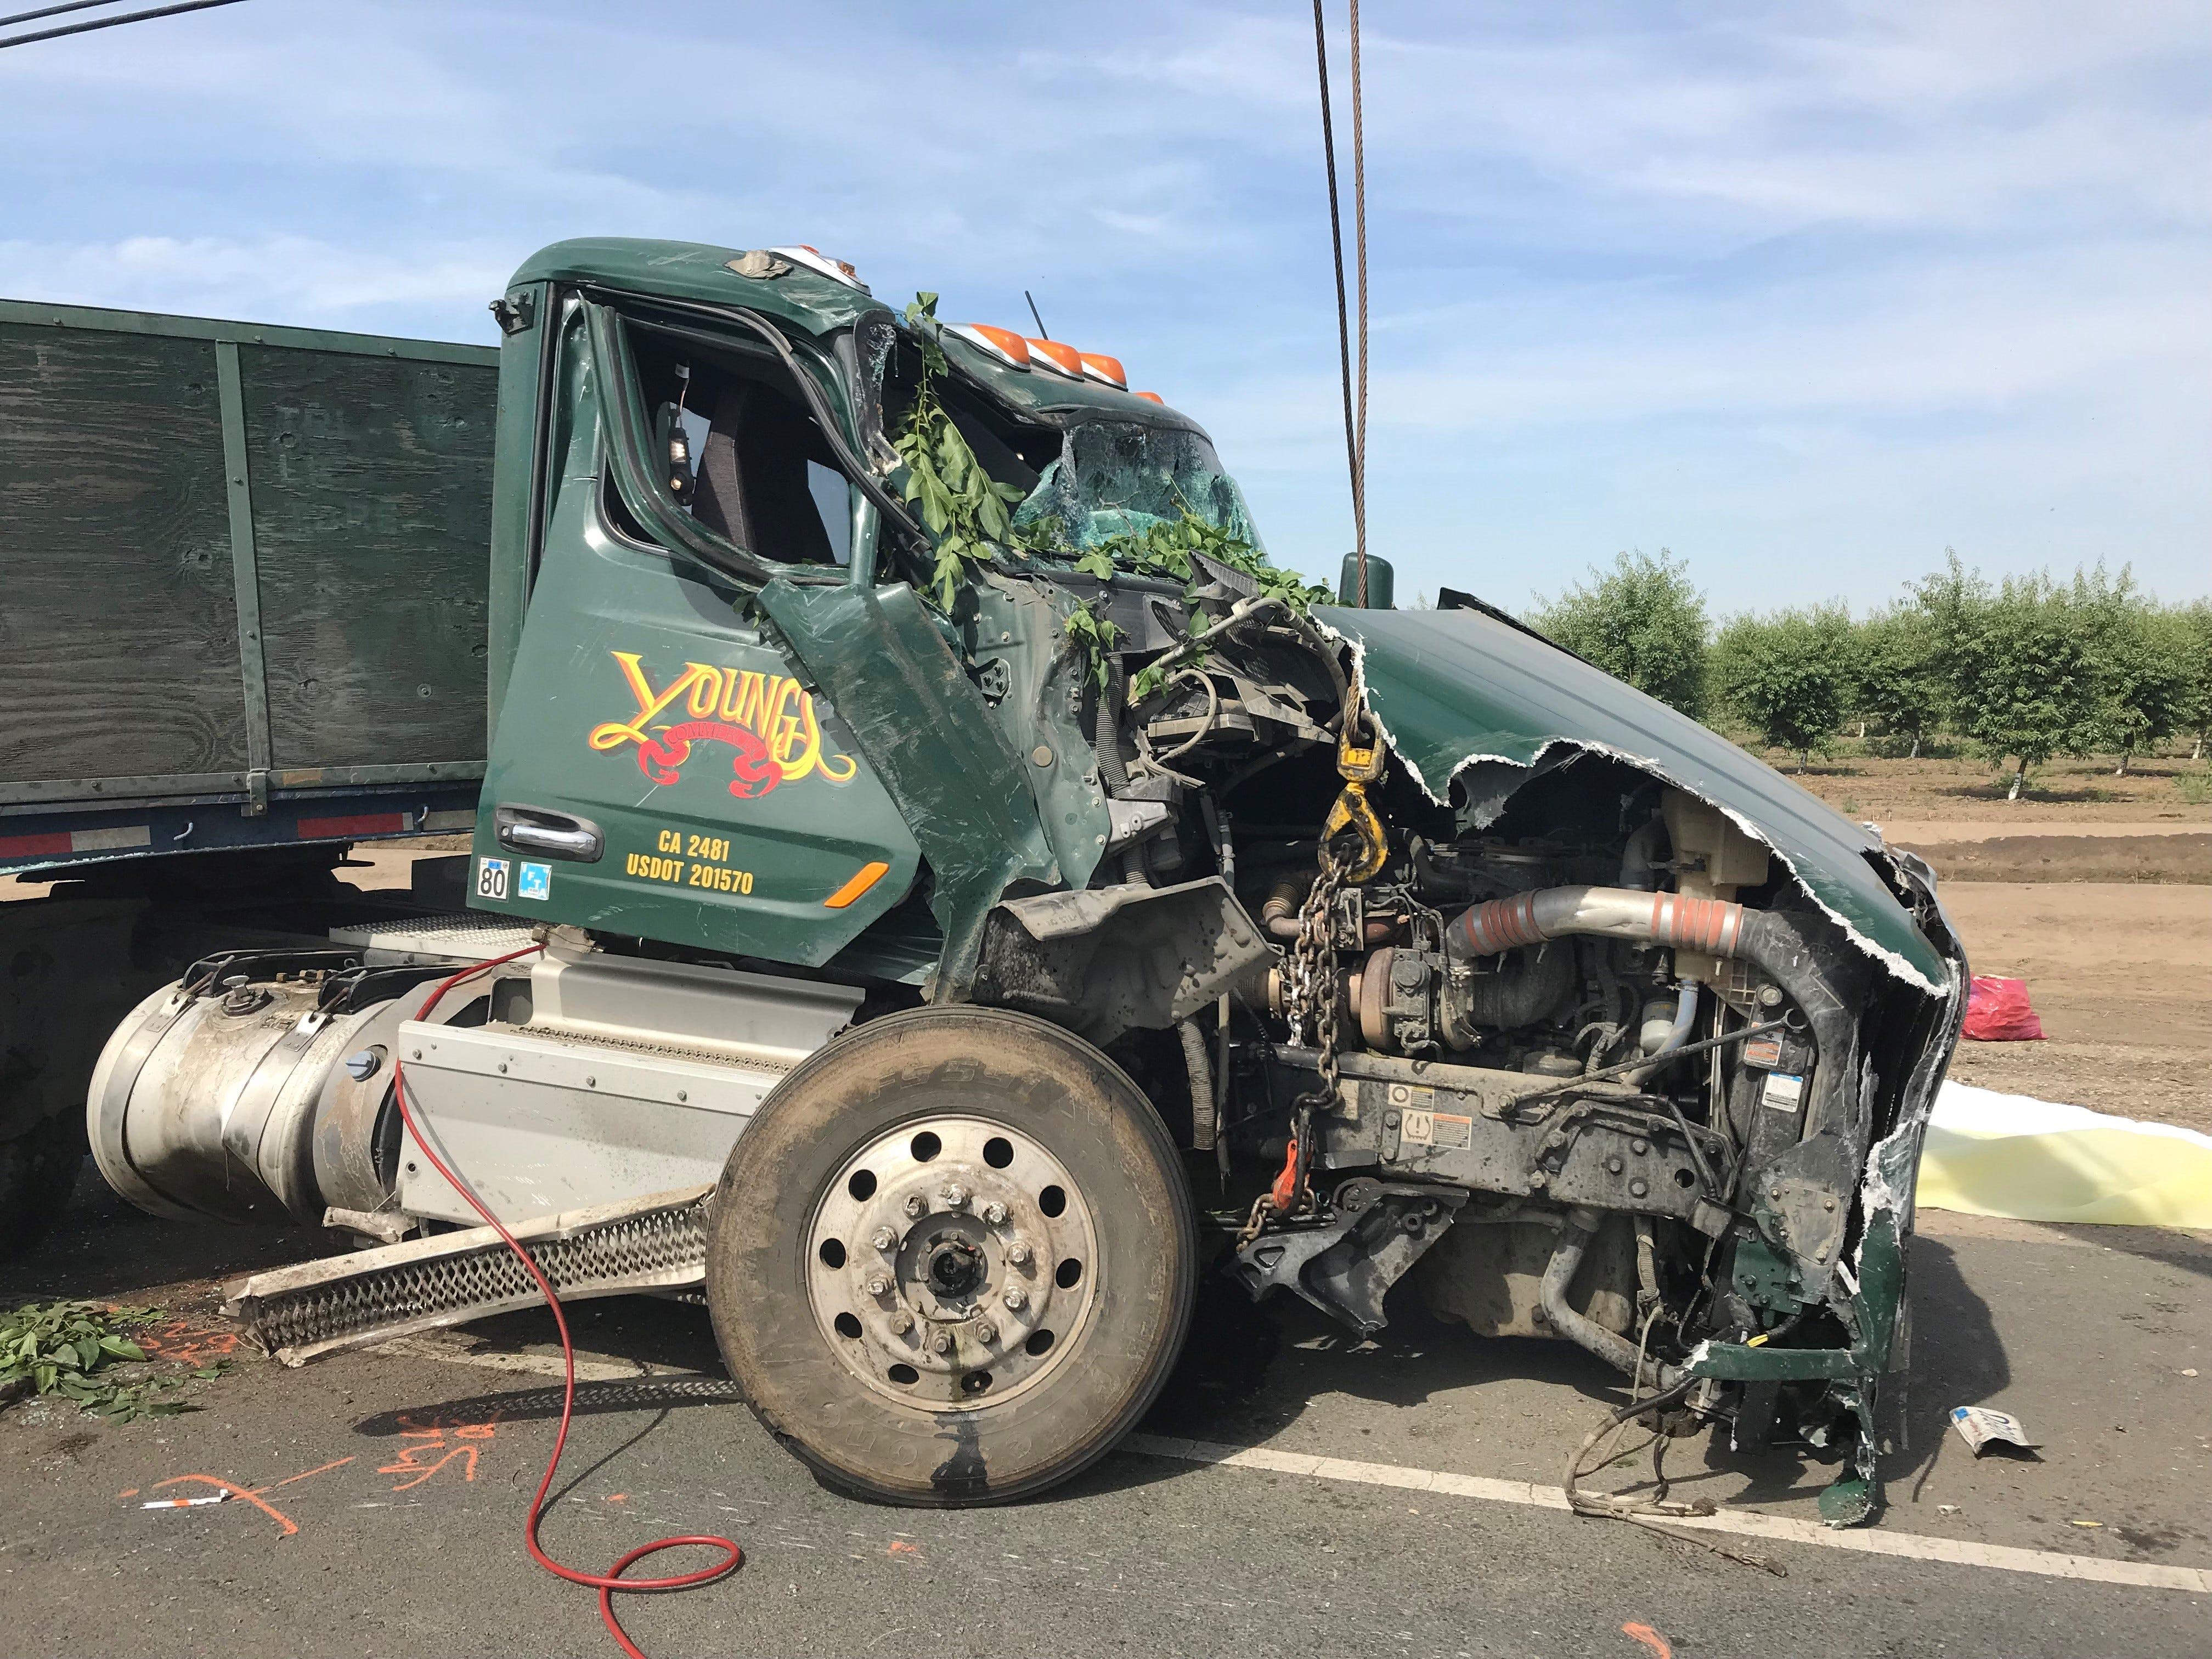 Two Dead in Collision Near North Visalia, Highway 63 Closed